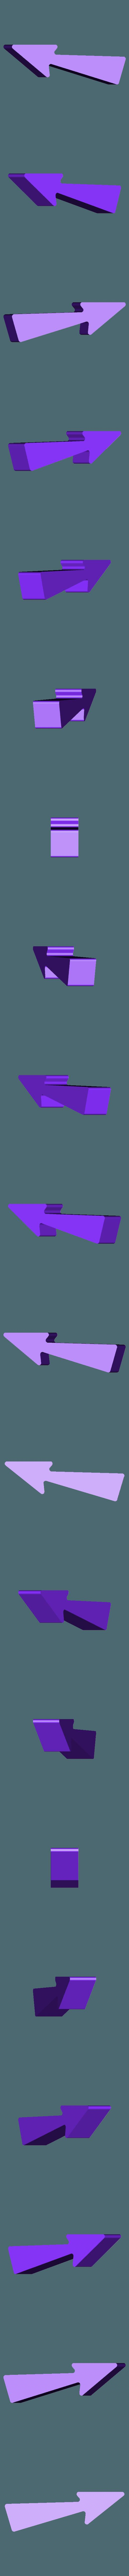 arrow.stl Download free STL file Flexible Phone Stand v2.0 • 3D printer model, Milanorage